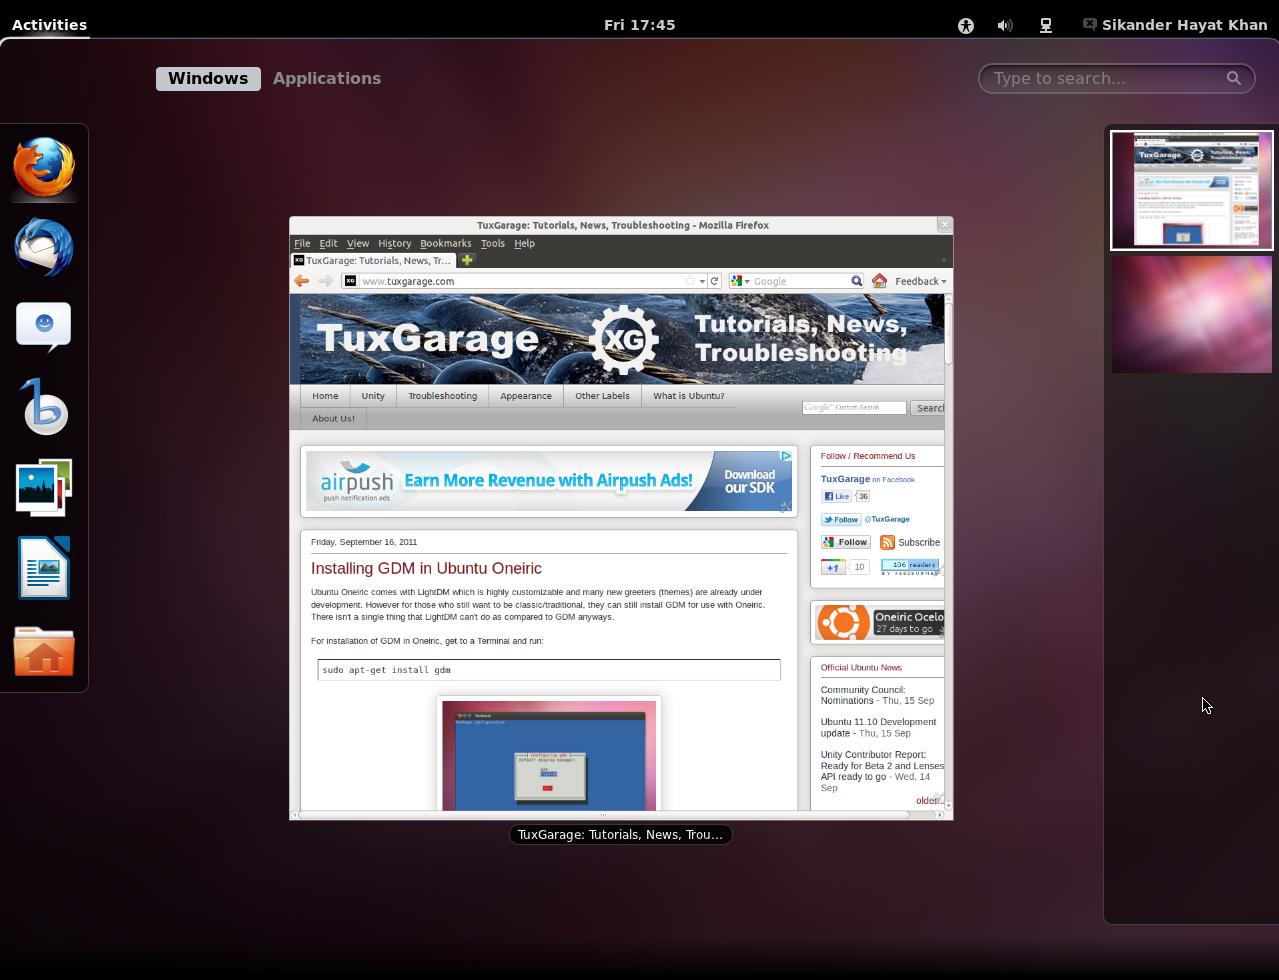 Ubuntu Oneiric GUI Options - Gnome Shell, Gnome Fallback and